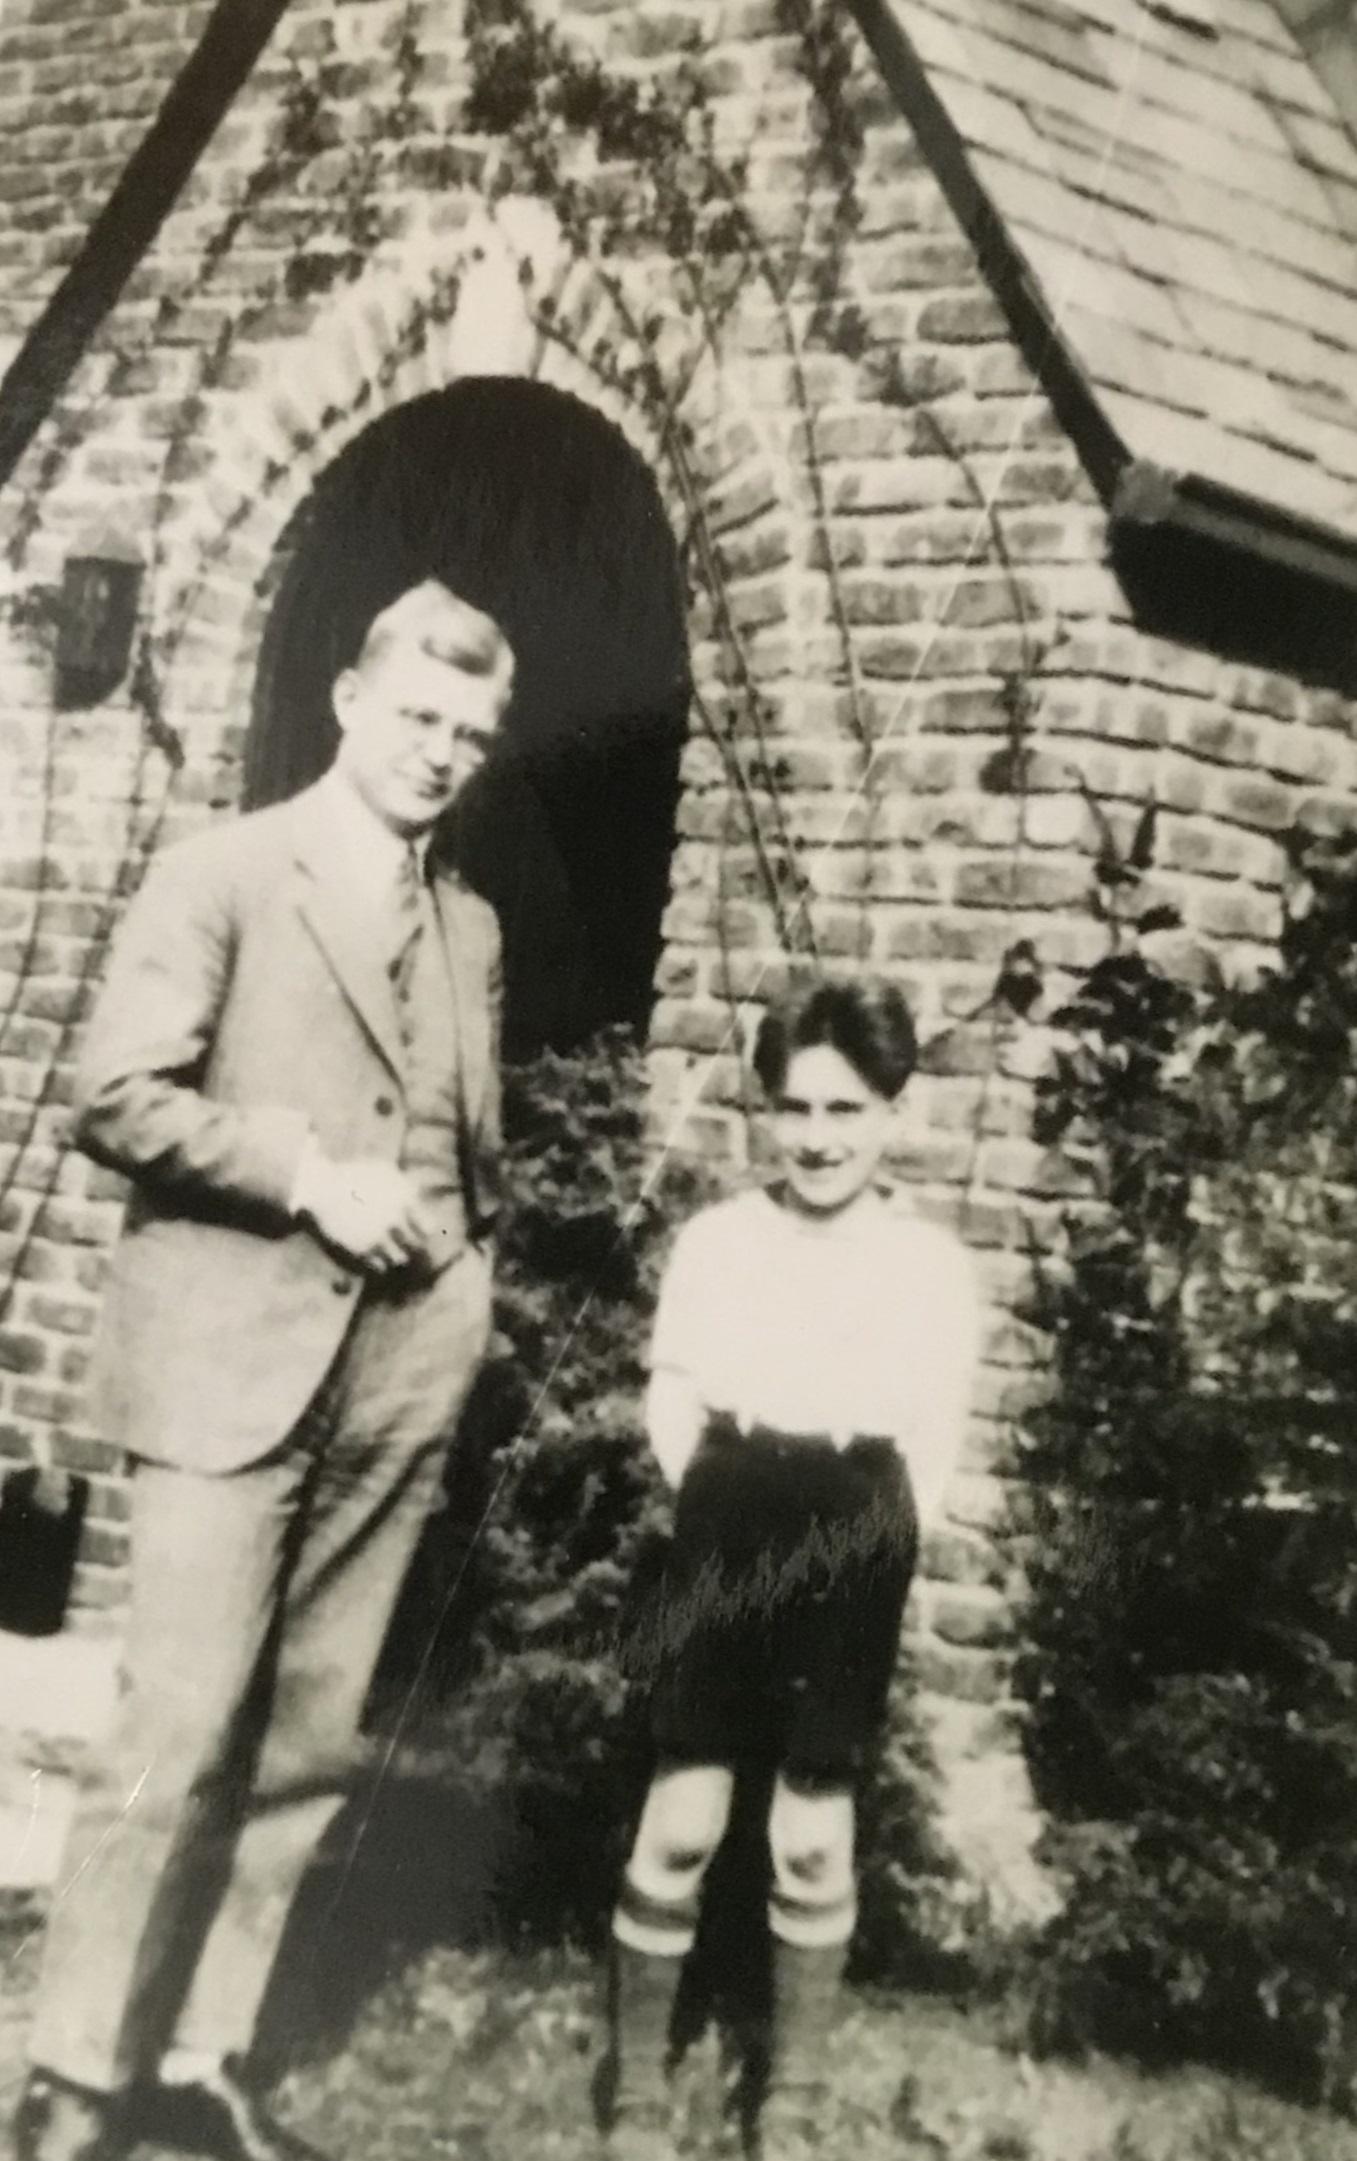 Dietrich Bonhoeffer with young Richard Ern